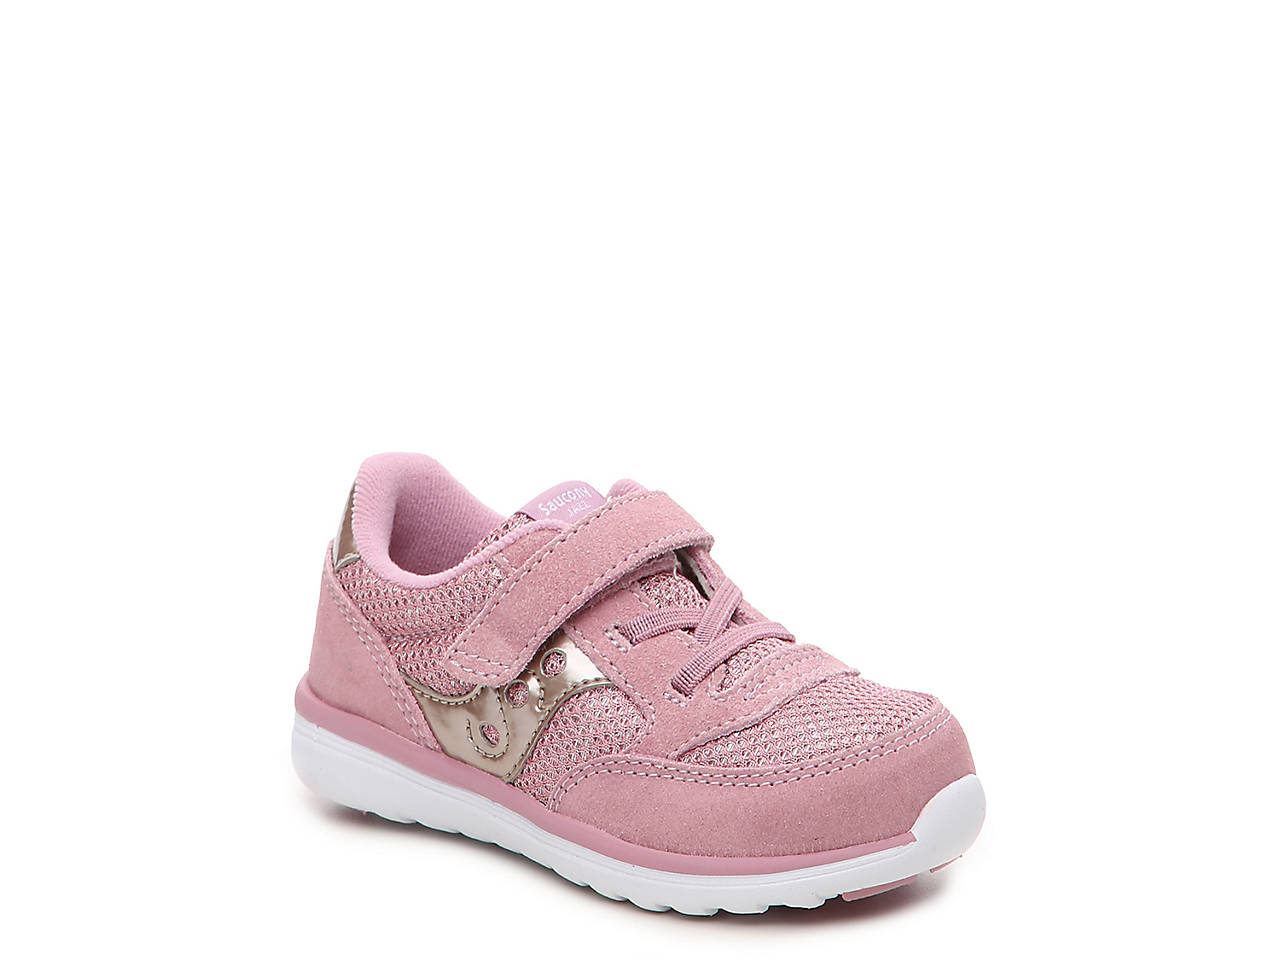 2521cc8e8c30 Saucony Baby Jazz Lite Infant   Toddler Sneaker Kids Shoes